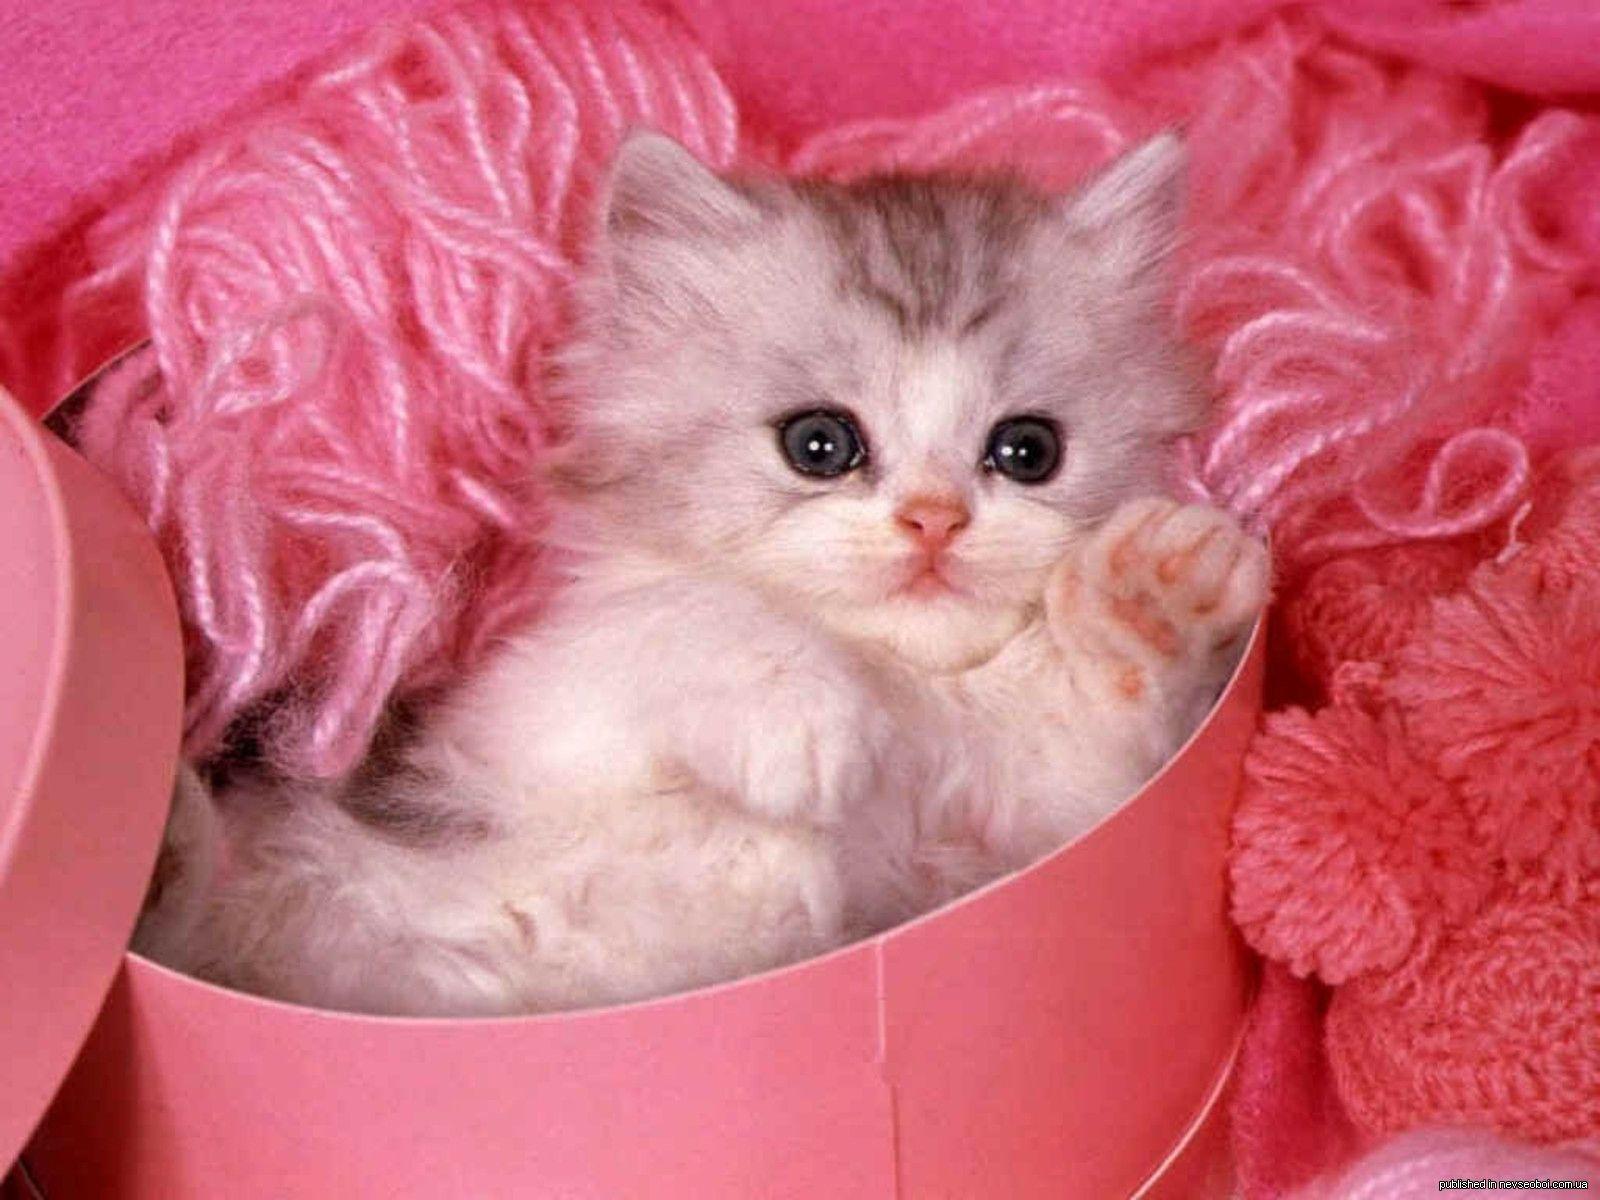 Kitten Cute Cat Wallpaper Cute Cats And Dogs Cute Kitten Gif